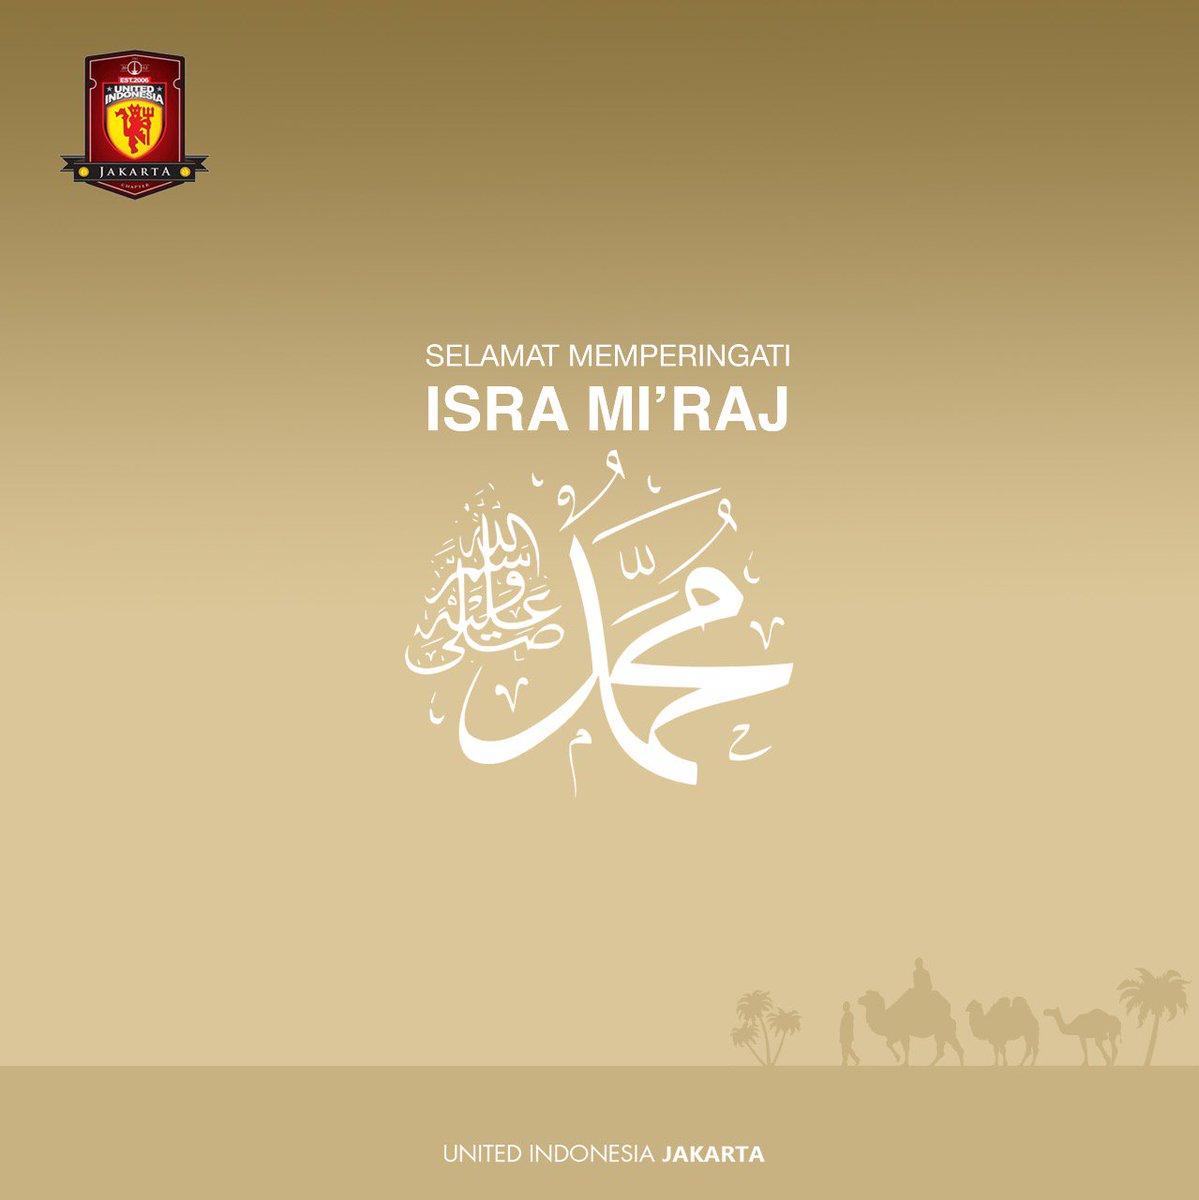 Selamat memperingati Isra Miraj Nabi Muhammad SAW bagi muslim dan muslimah di dunia dan selamat berlibur.   #UIJKT